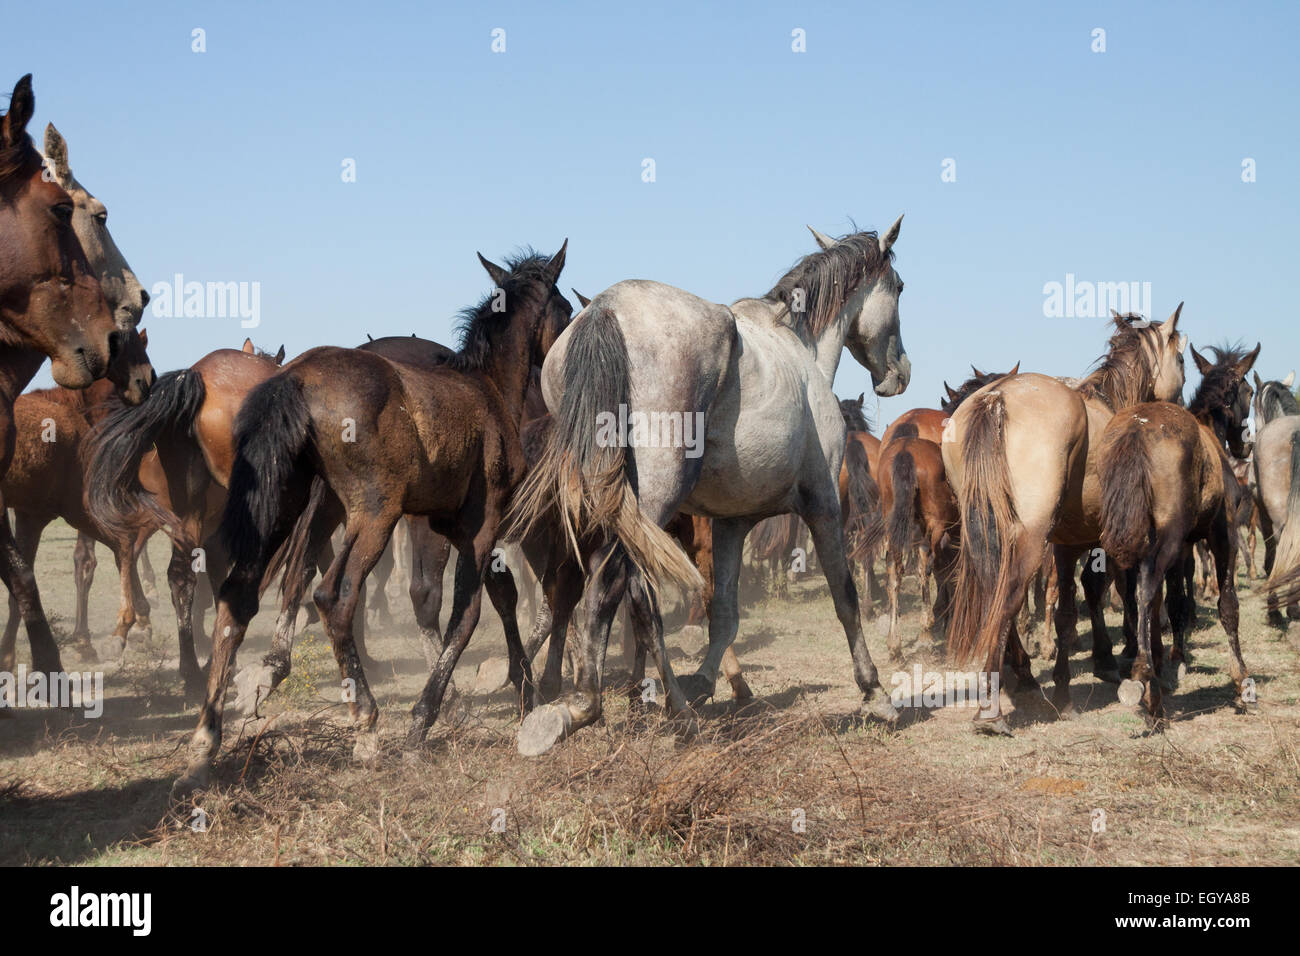 Herd Of Wild Horses Running Wild In The Countryside Almonte Huelva Stock Photo Alamy